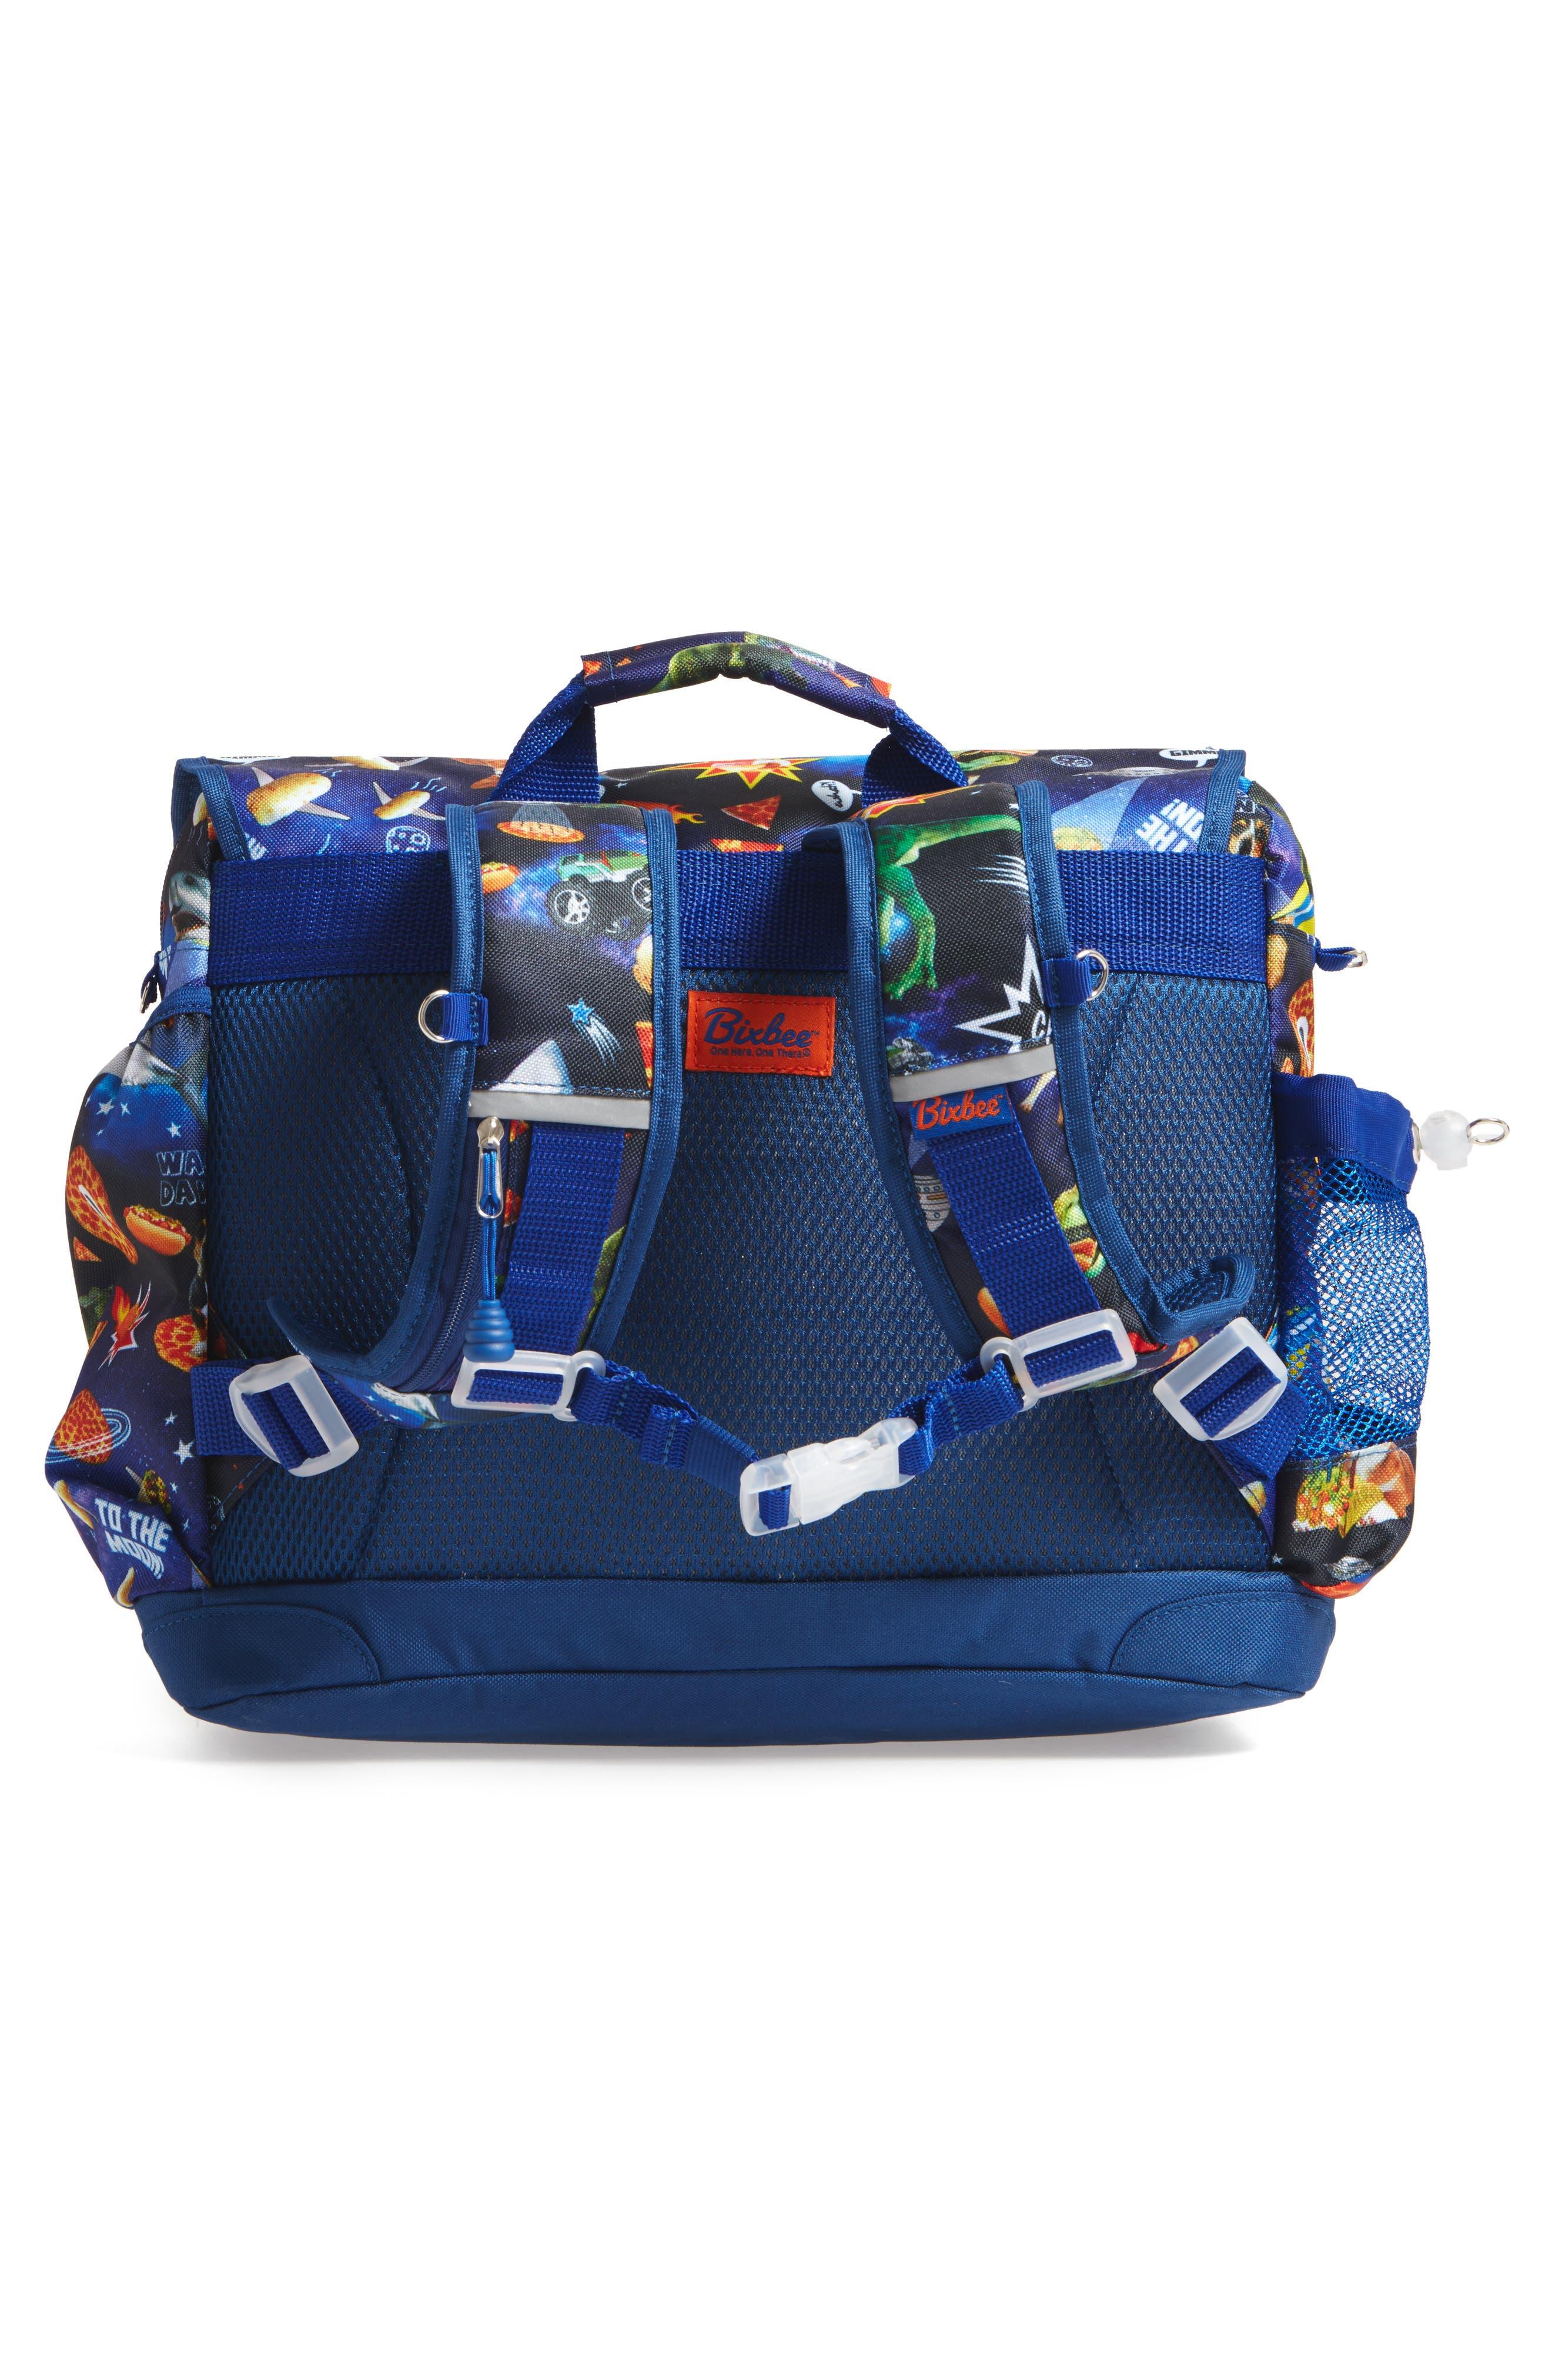 Meme Space Odyssey Backpack,                             Alternate thumbnail 2, color,                             400